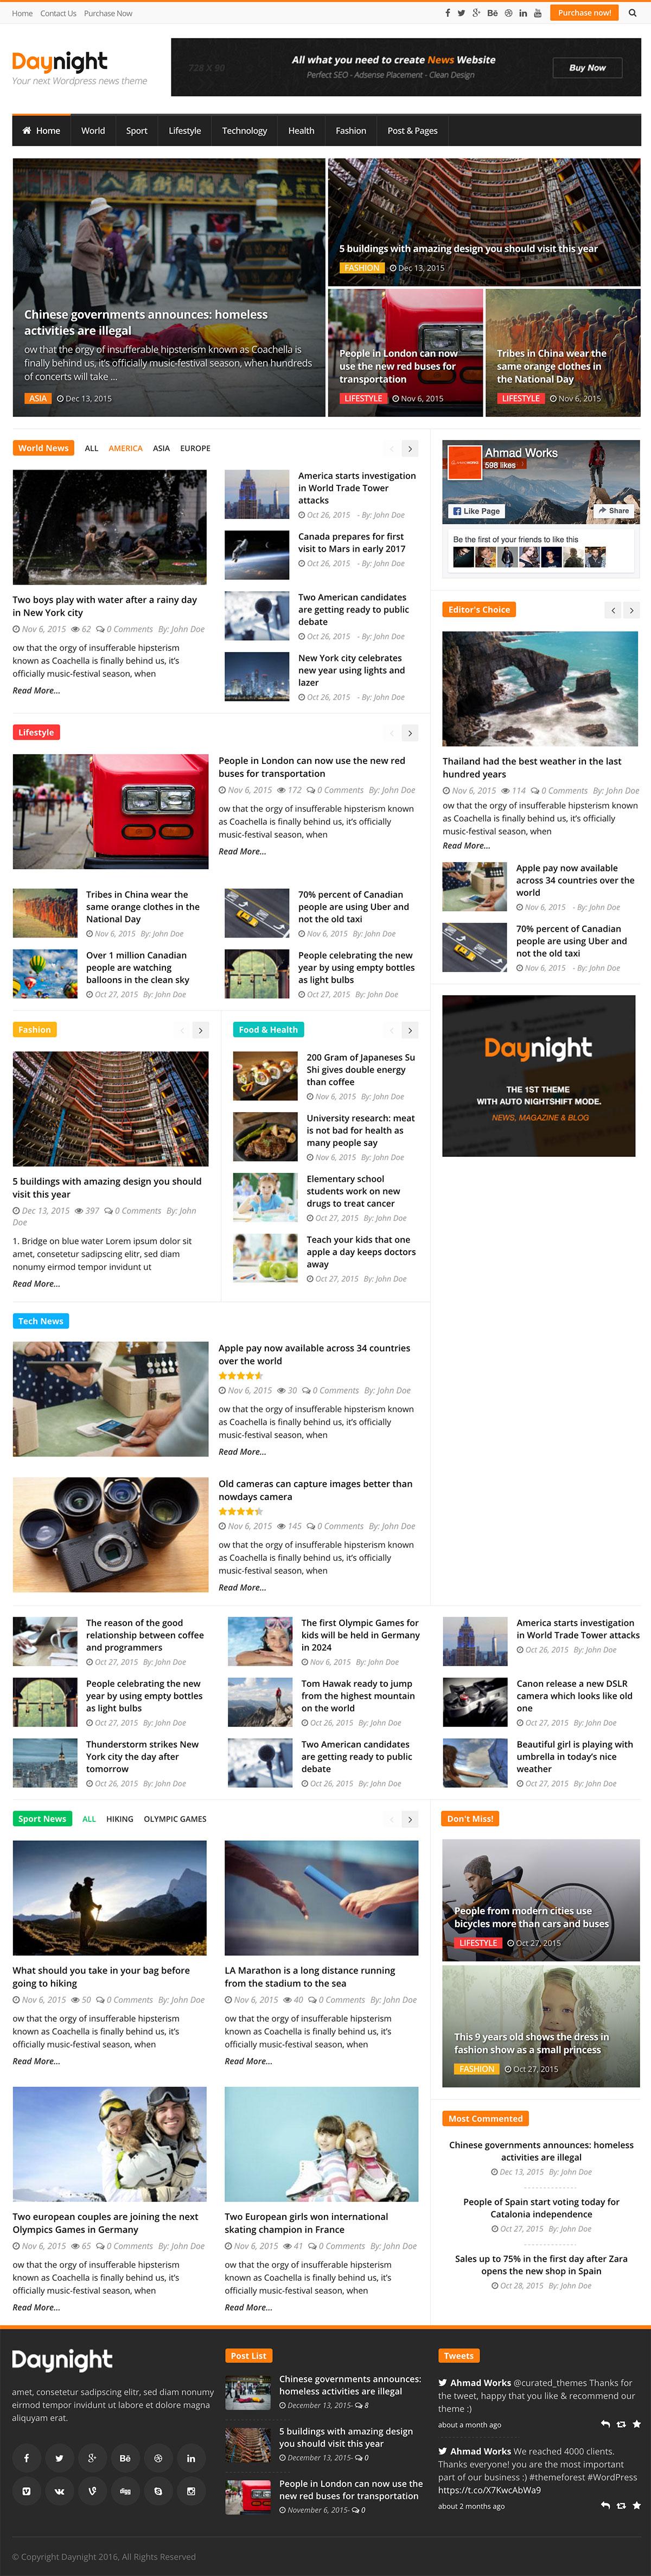 Daynight Magazine - News Magazine Theme